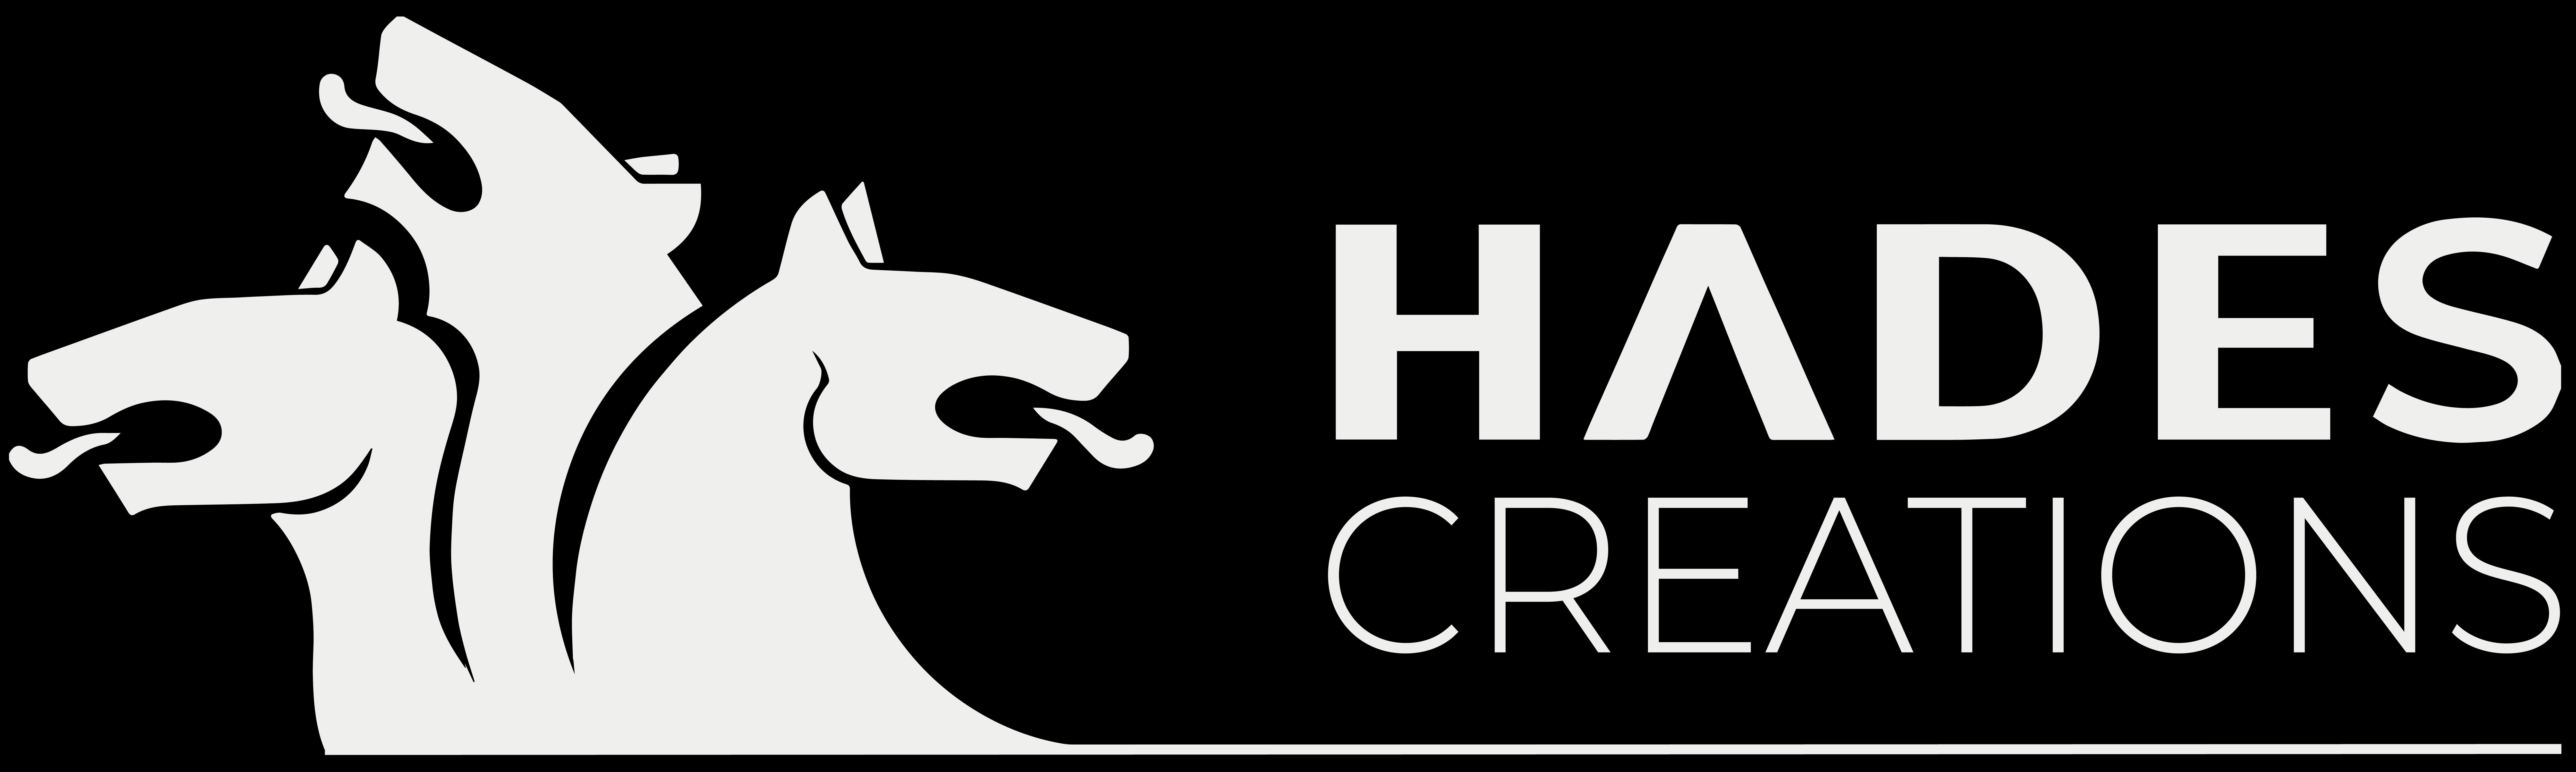 Hades Creations